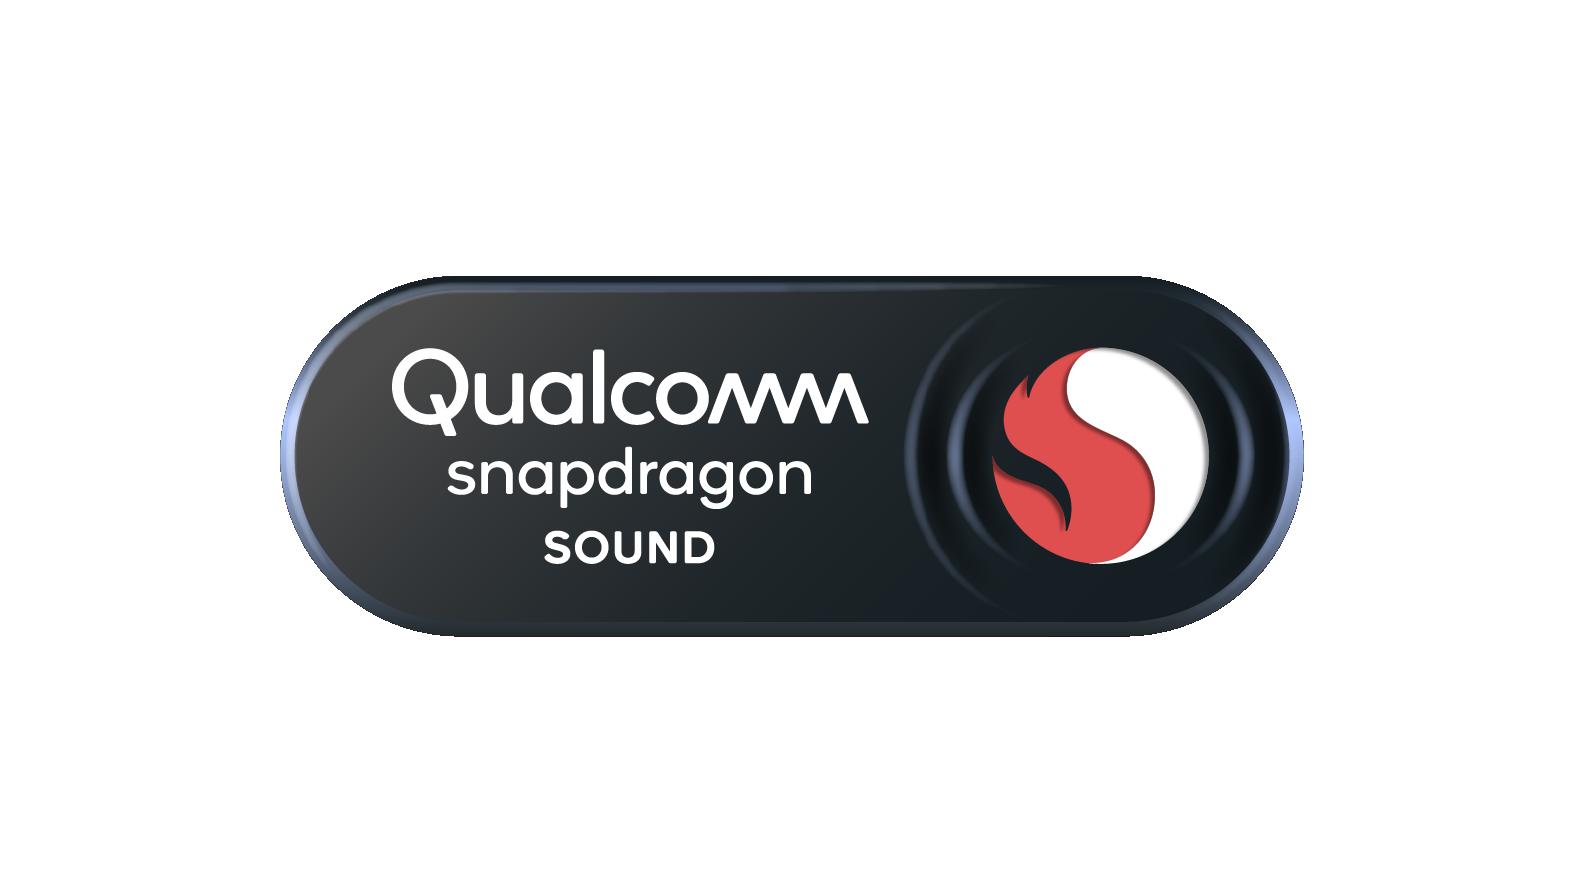 https://www.techboxlab.com.br/images/conteudo/hardware/qualcomm_sound3.png